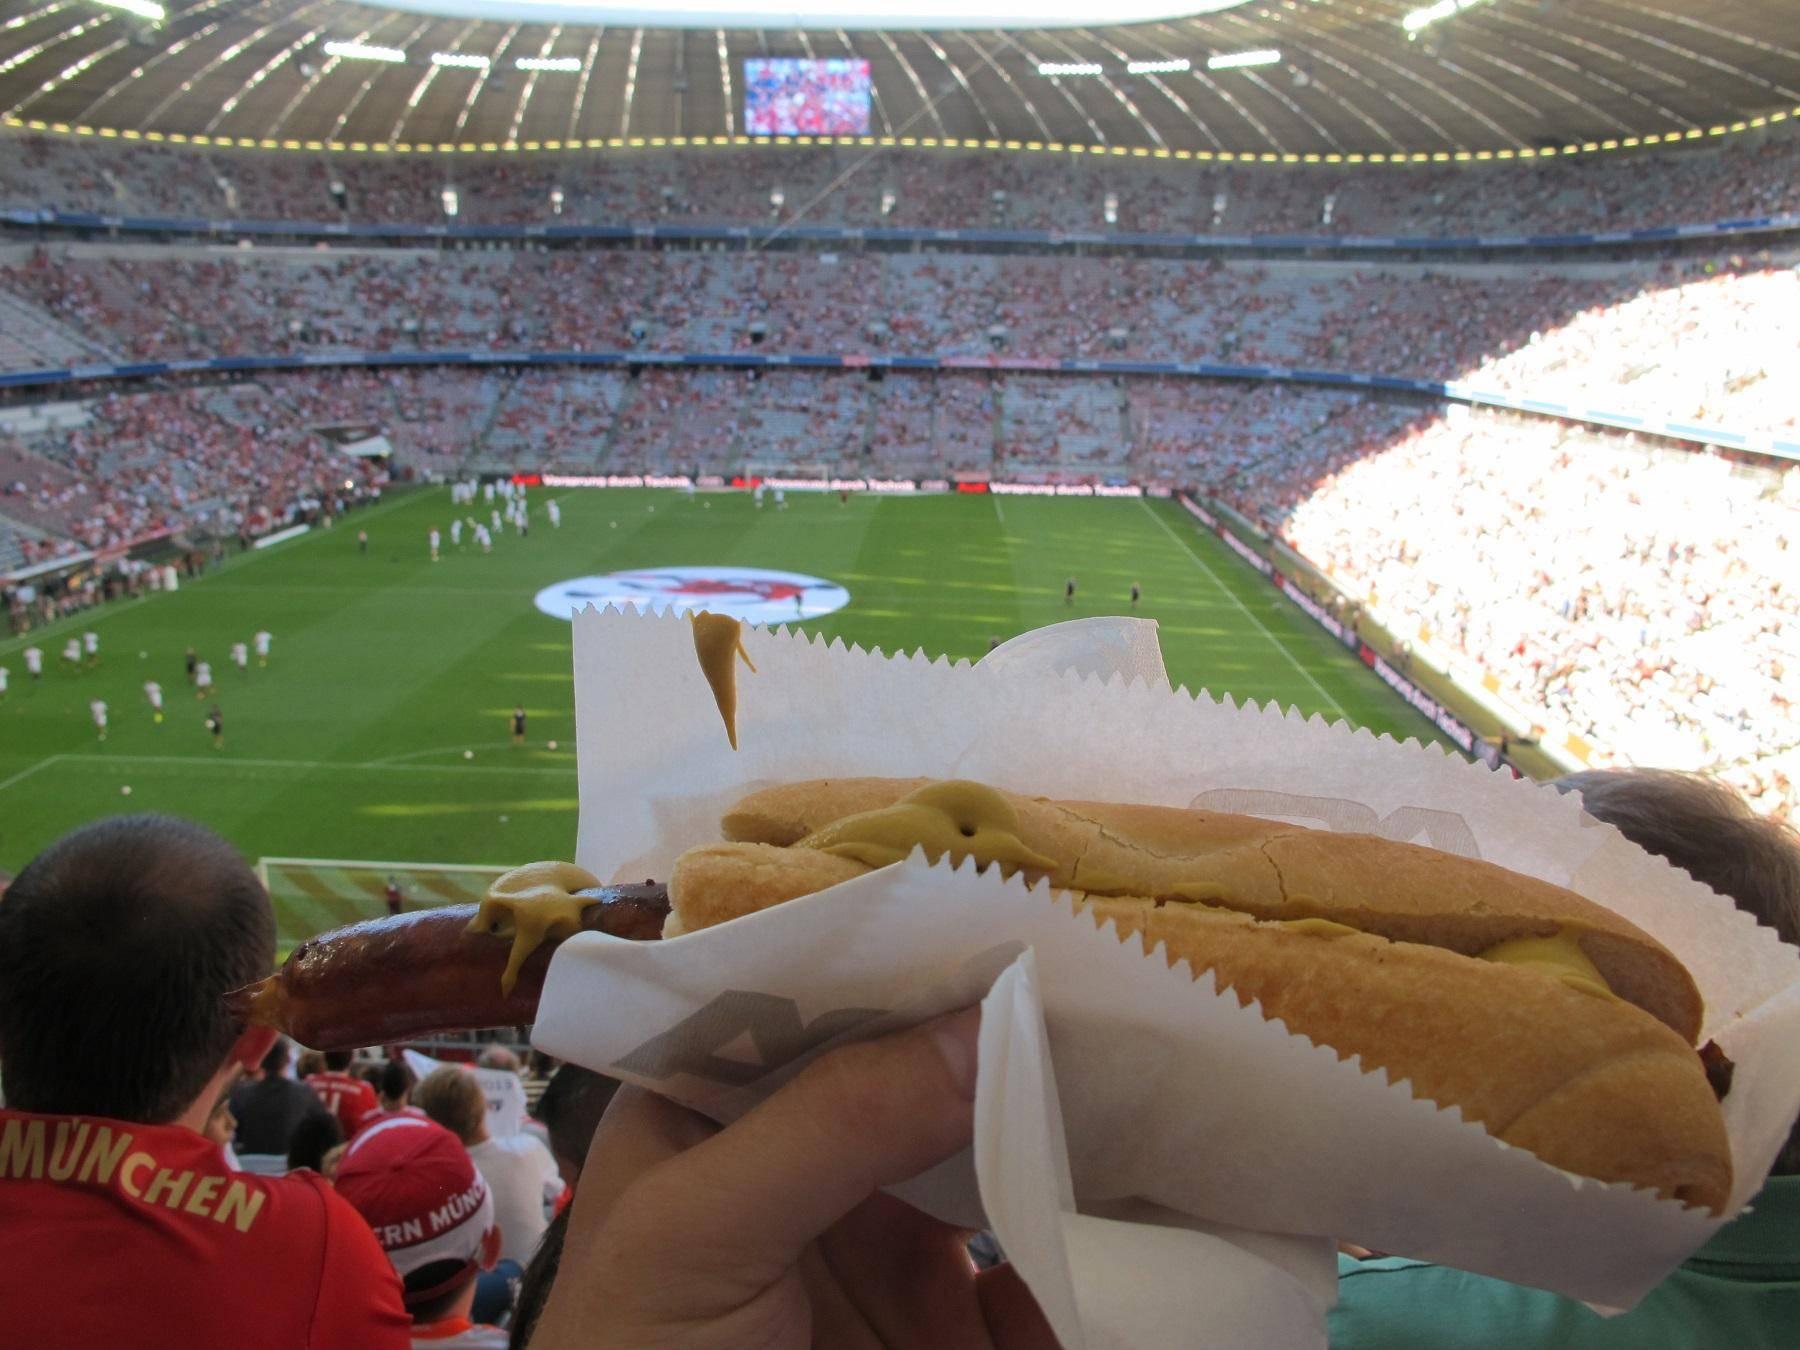 audicup fajnovy hotdog